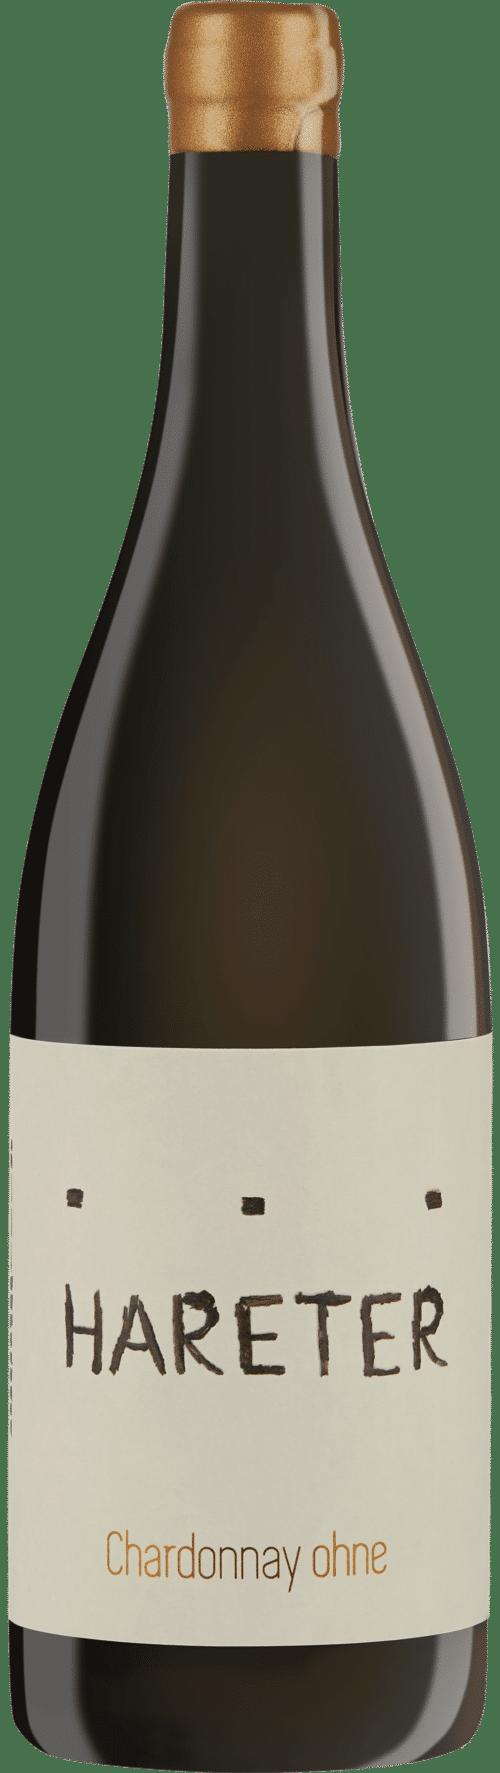 Hareter - Chardonnay ohne